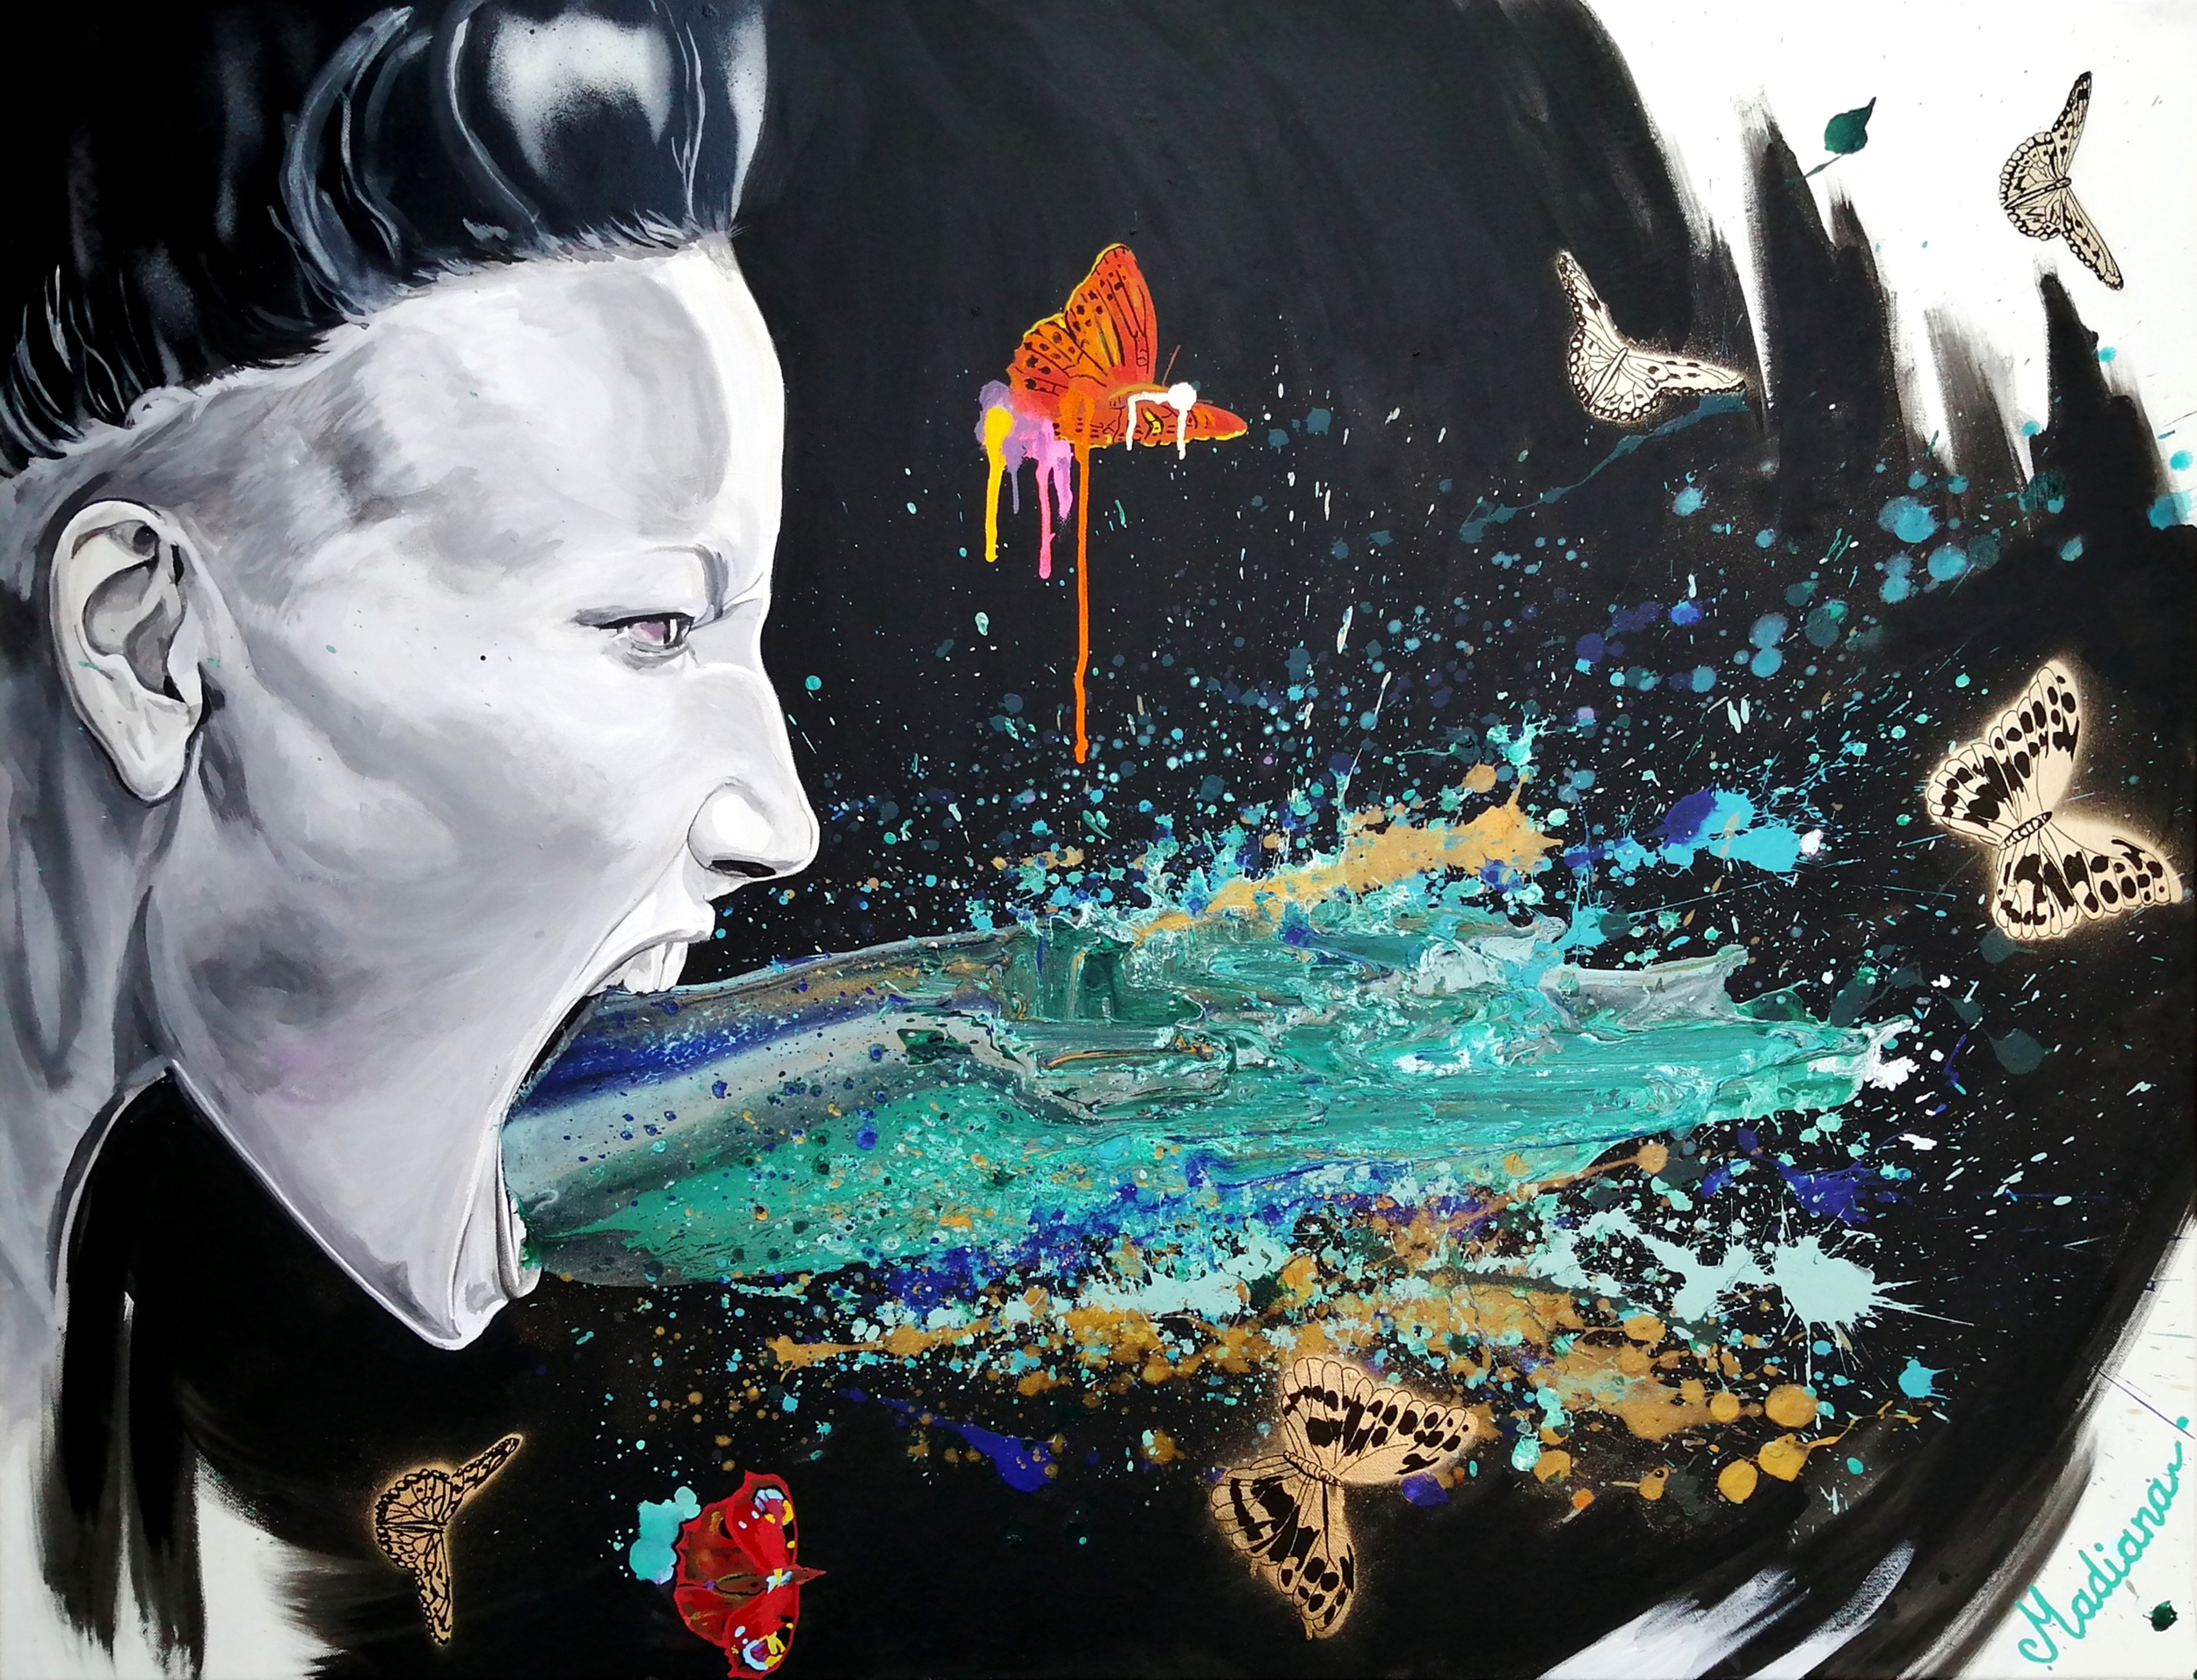 reproduction toile peinture art contemporain street cri femme multicolore